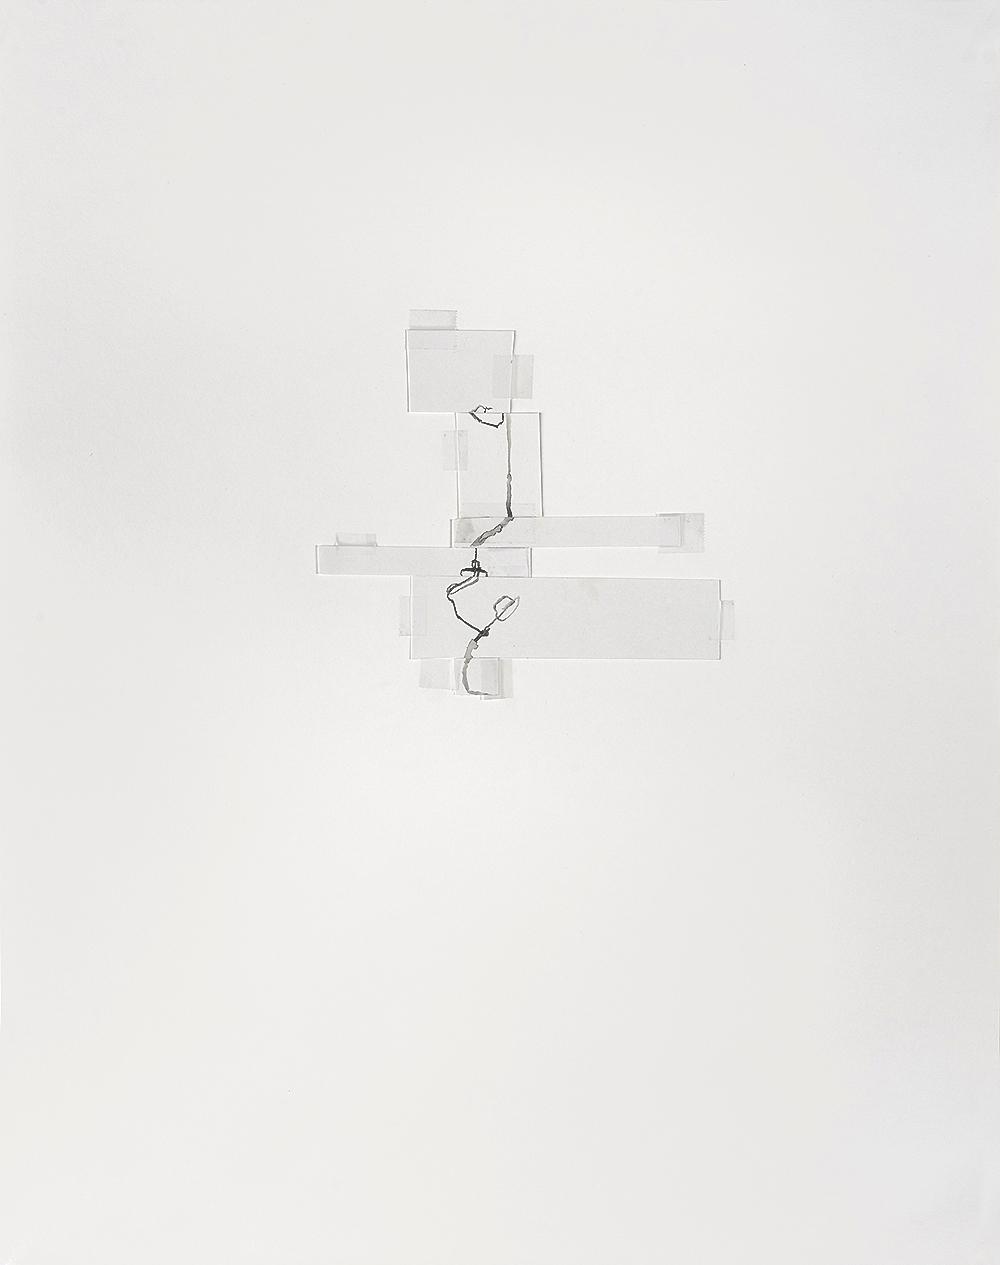 gaga,  2015 collaboration with Janine Antoni  gouache, tape, paper 22 x 16 in / 56 x 41 cm